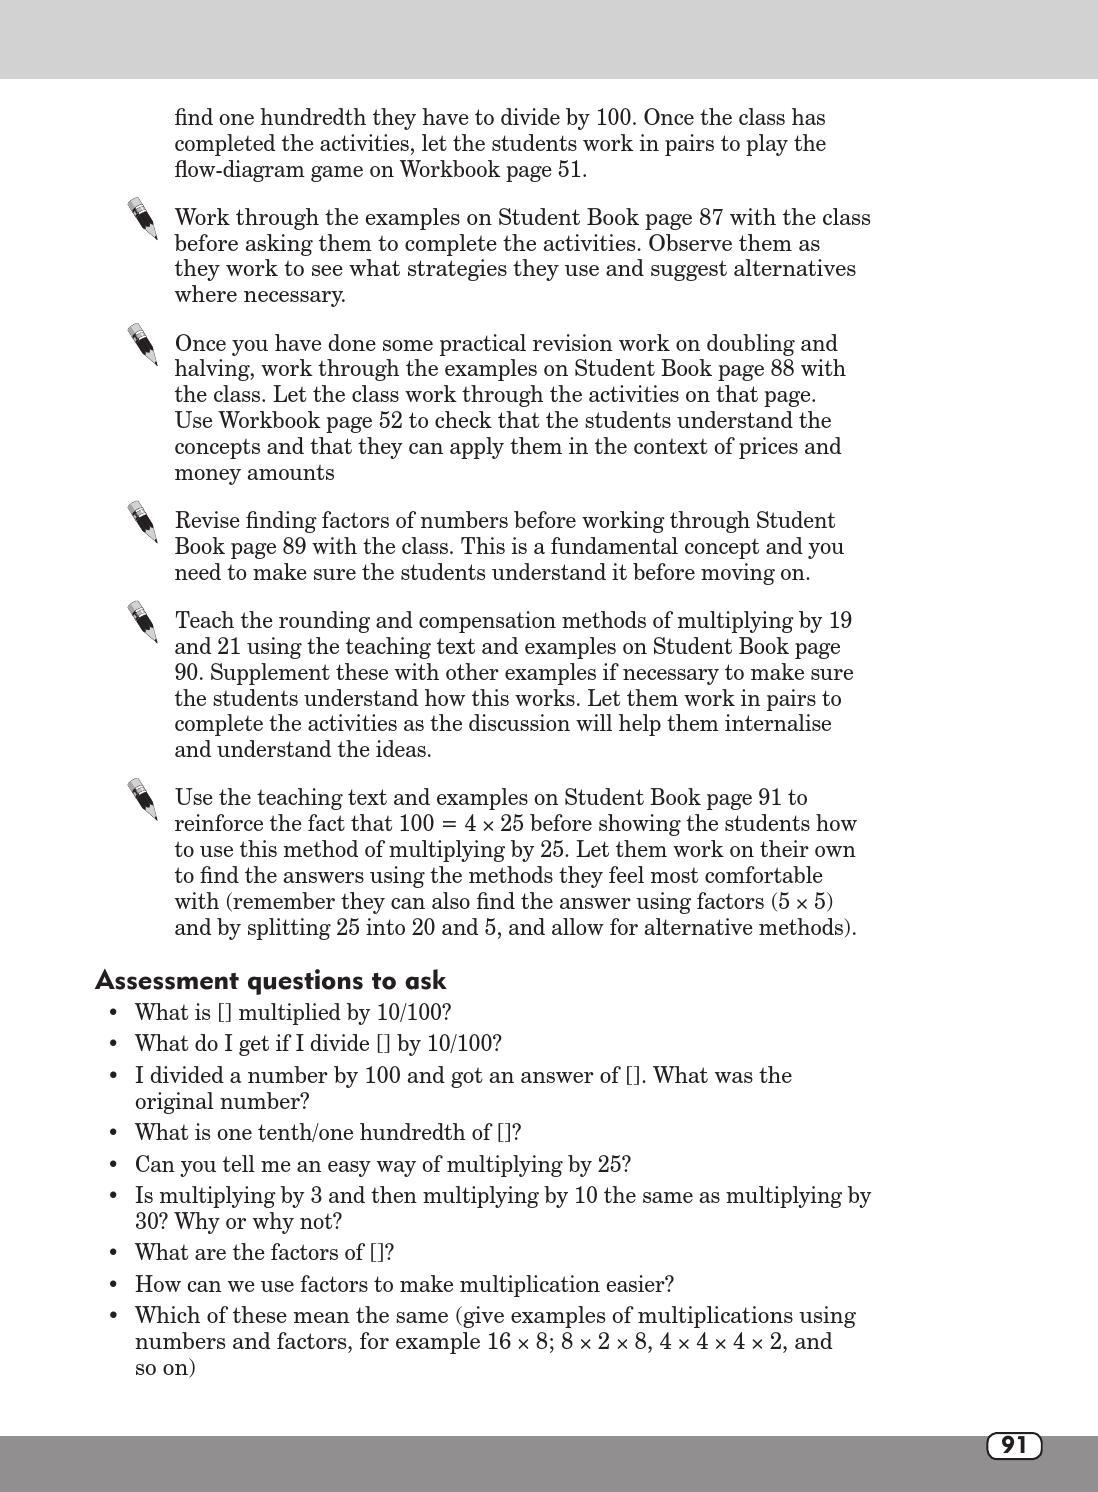 Nelson international maths teacher guide 5 by hany mufeid - issuu